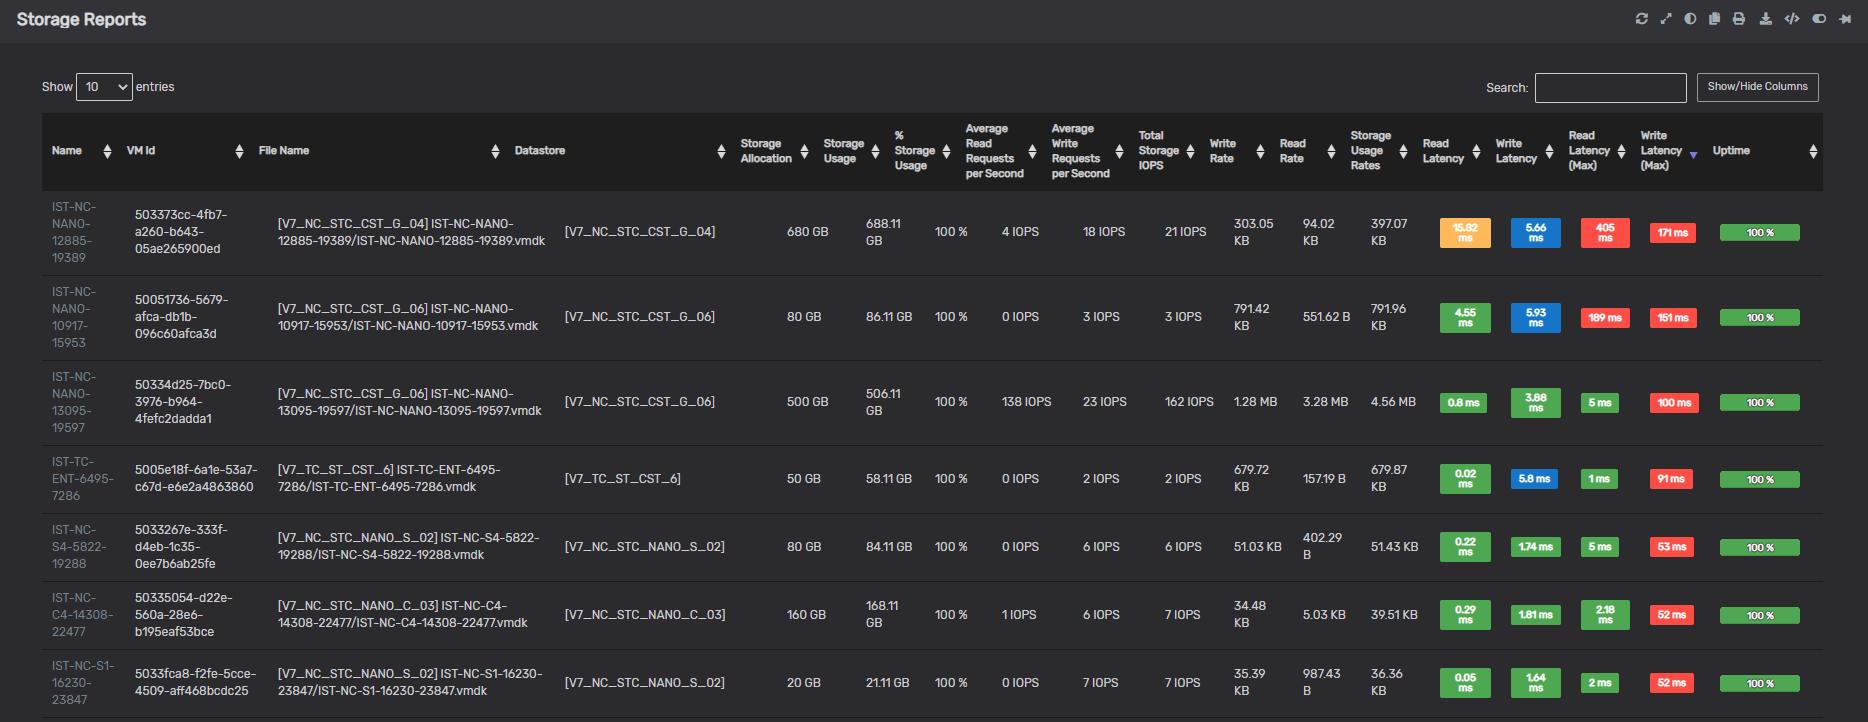 Virtual Disk Image (VMDK) Reports